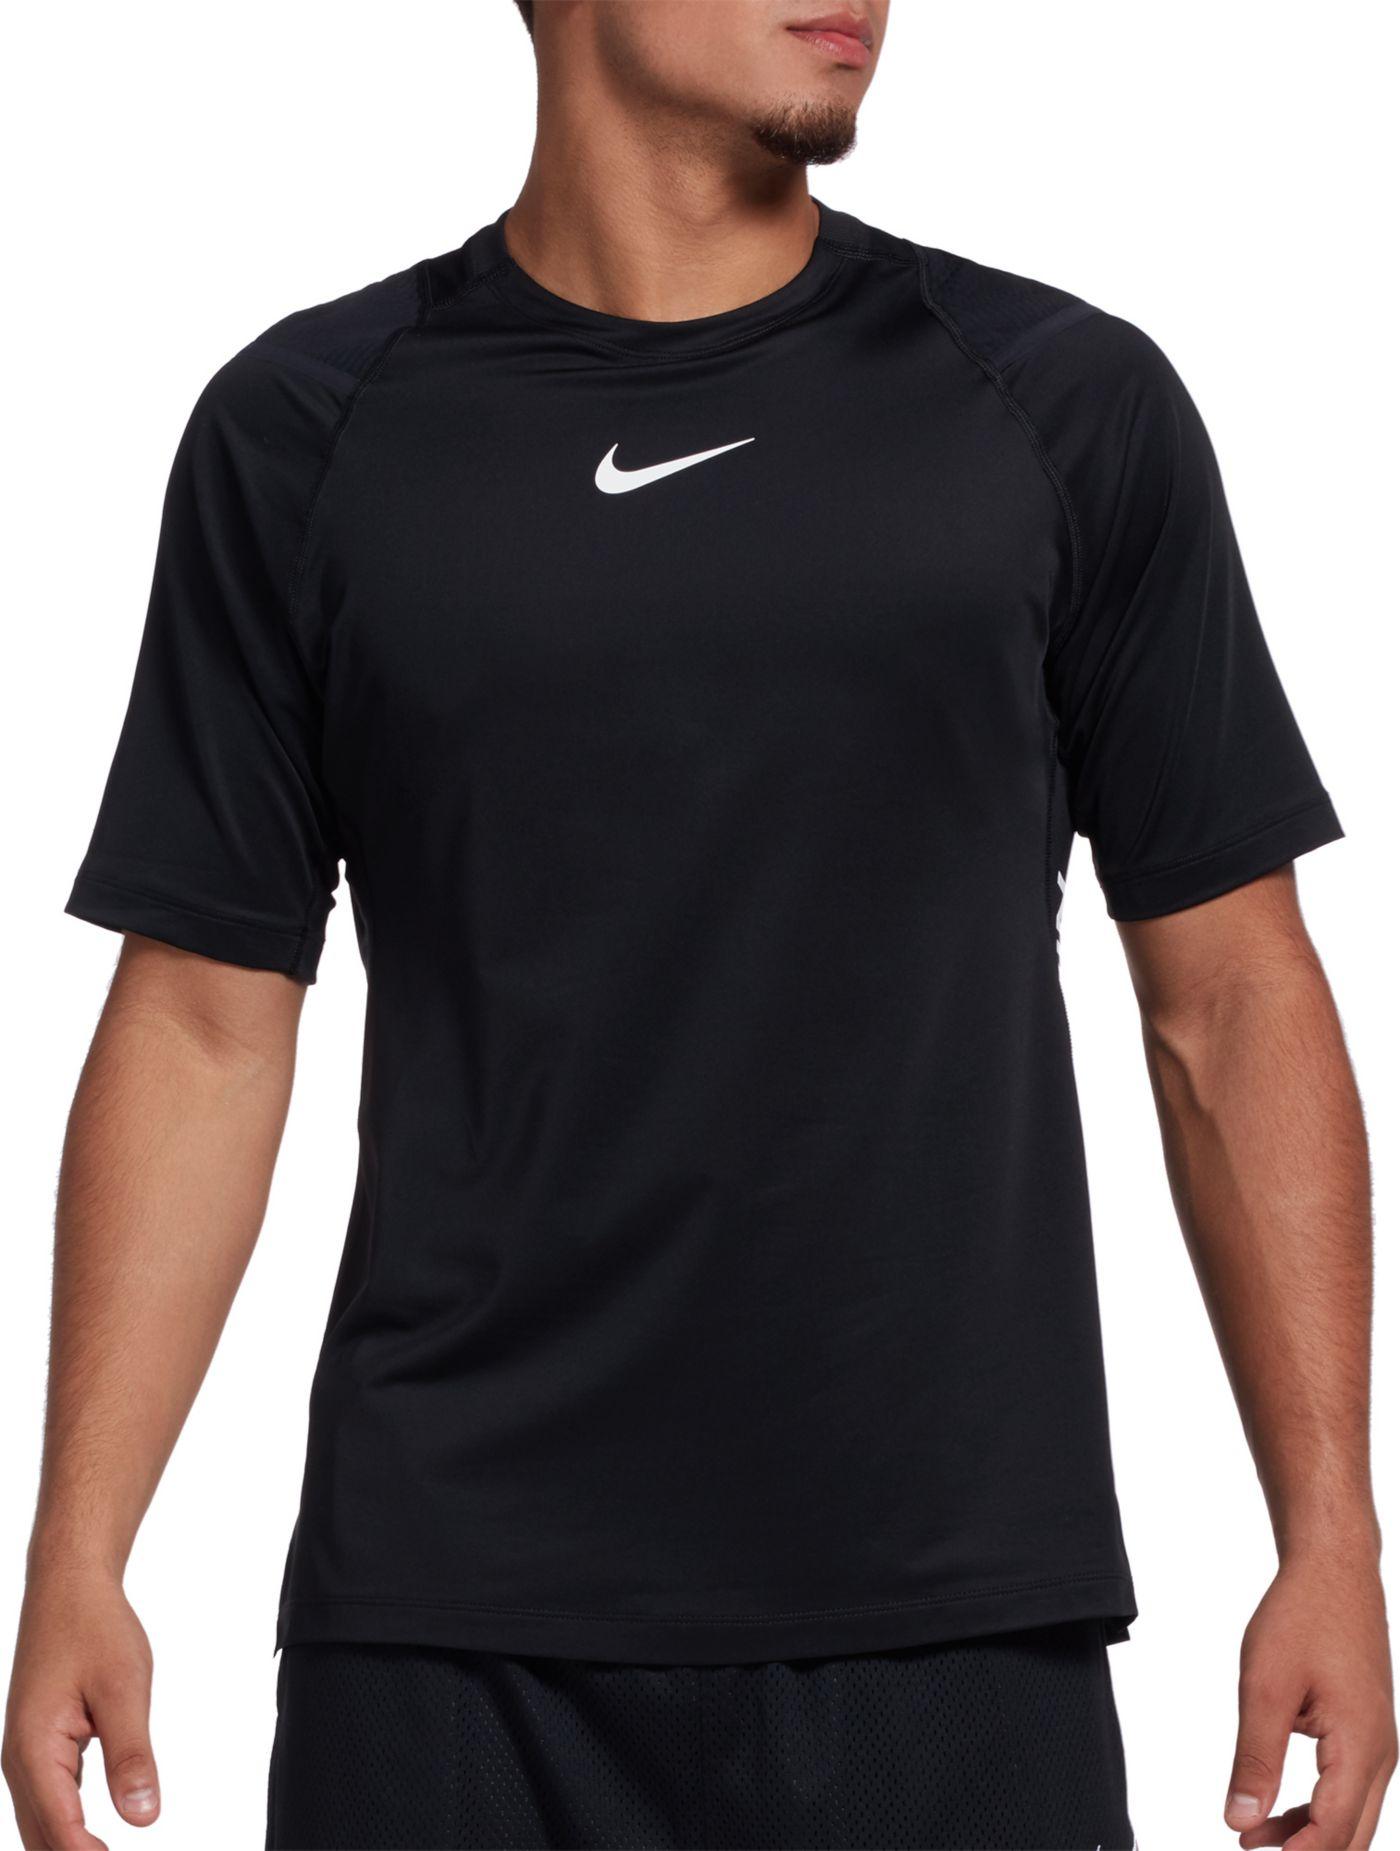 Nike Men's AeroAdapt Training Short Sleeve Top